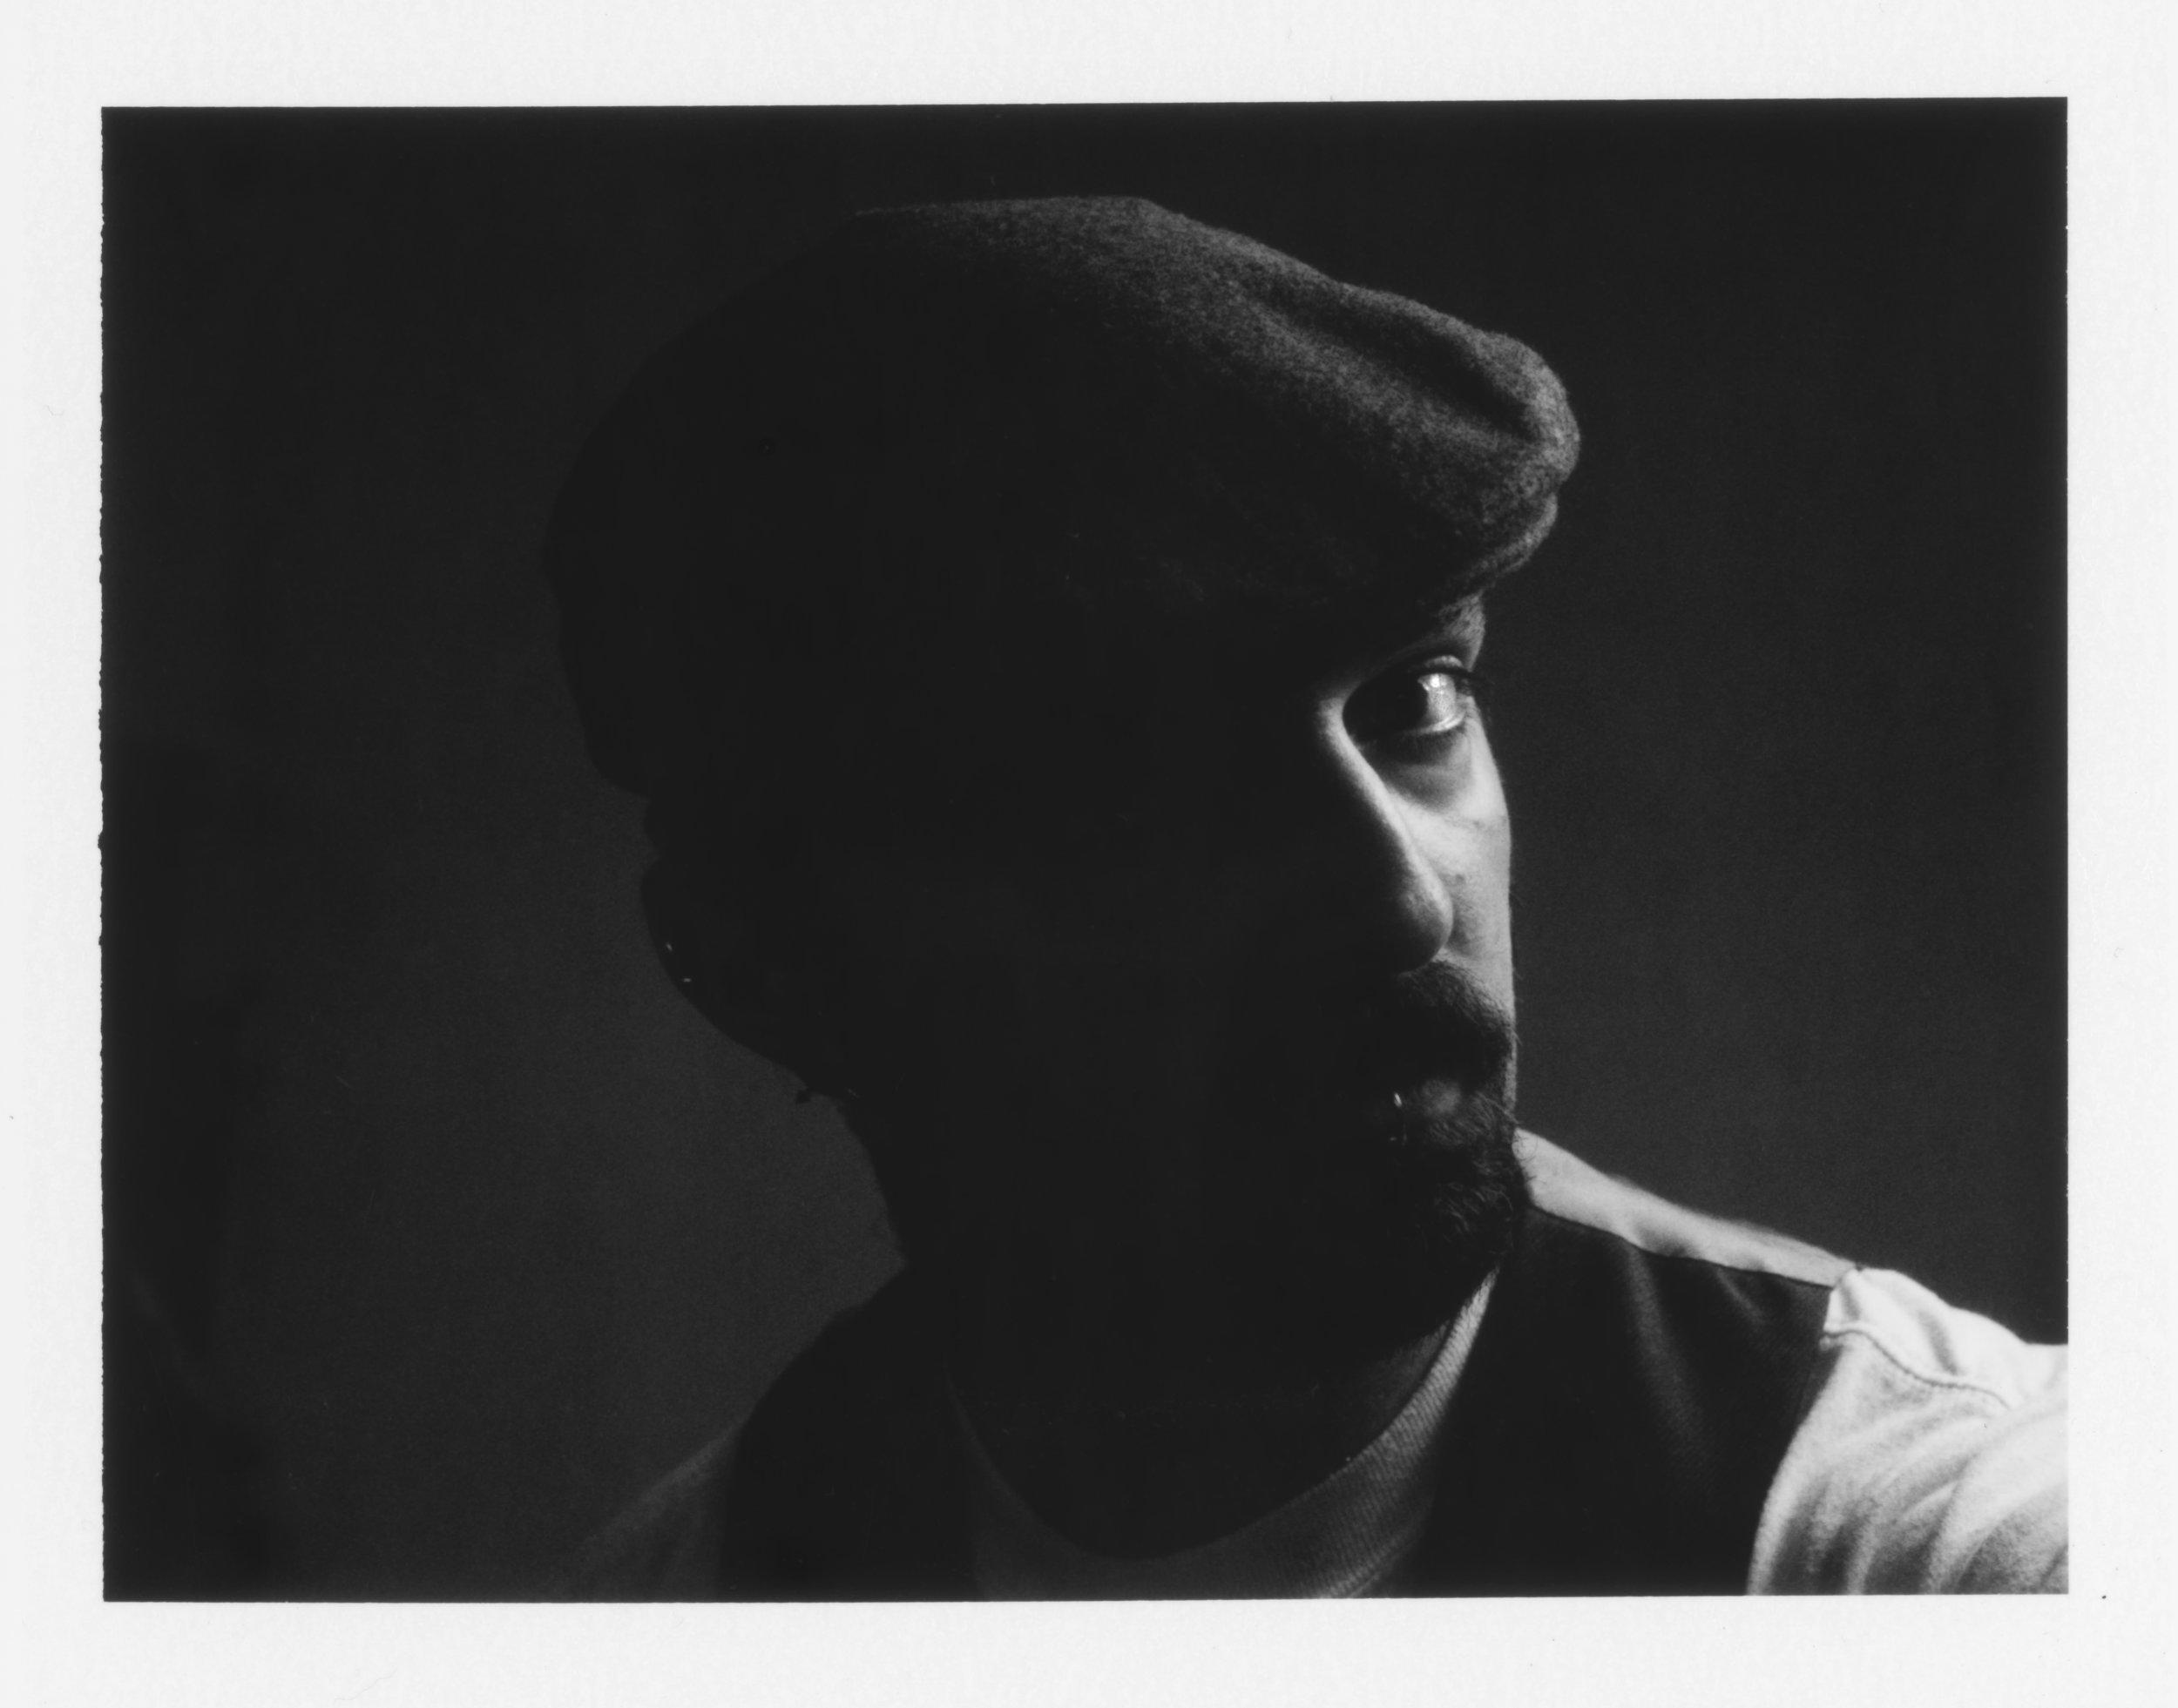 Self Portrait |  4x4 Crown Graphic | Fuji FP300b | Kelly-Shane Fuller